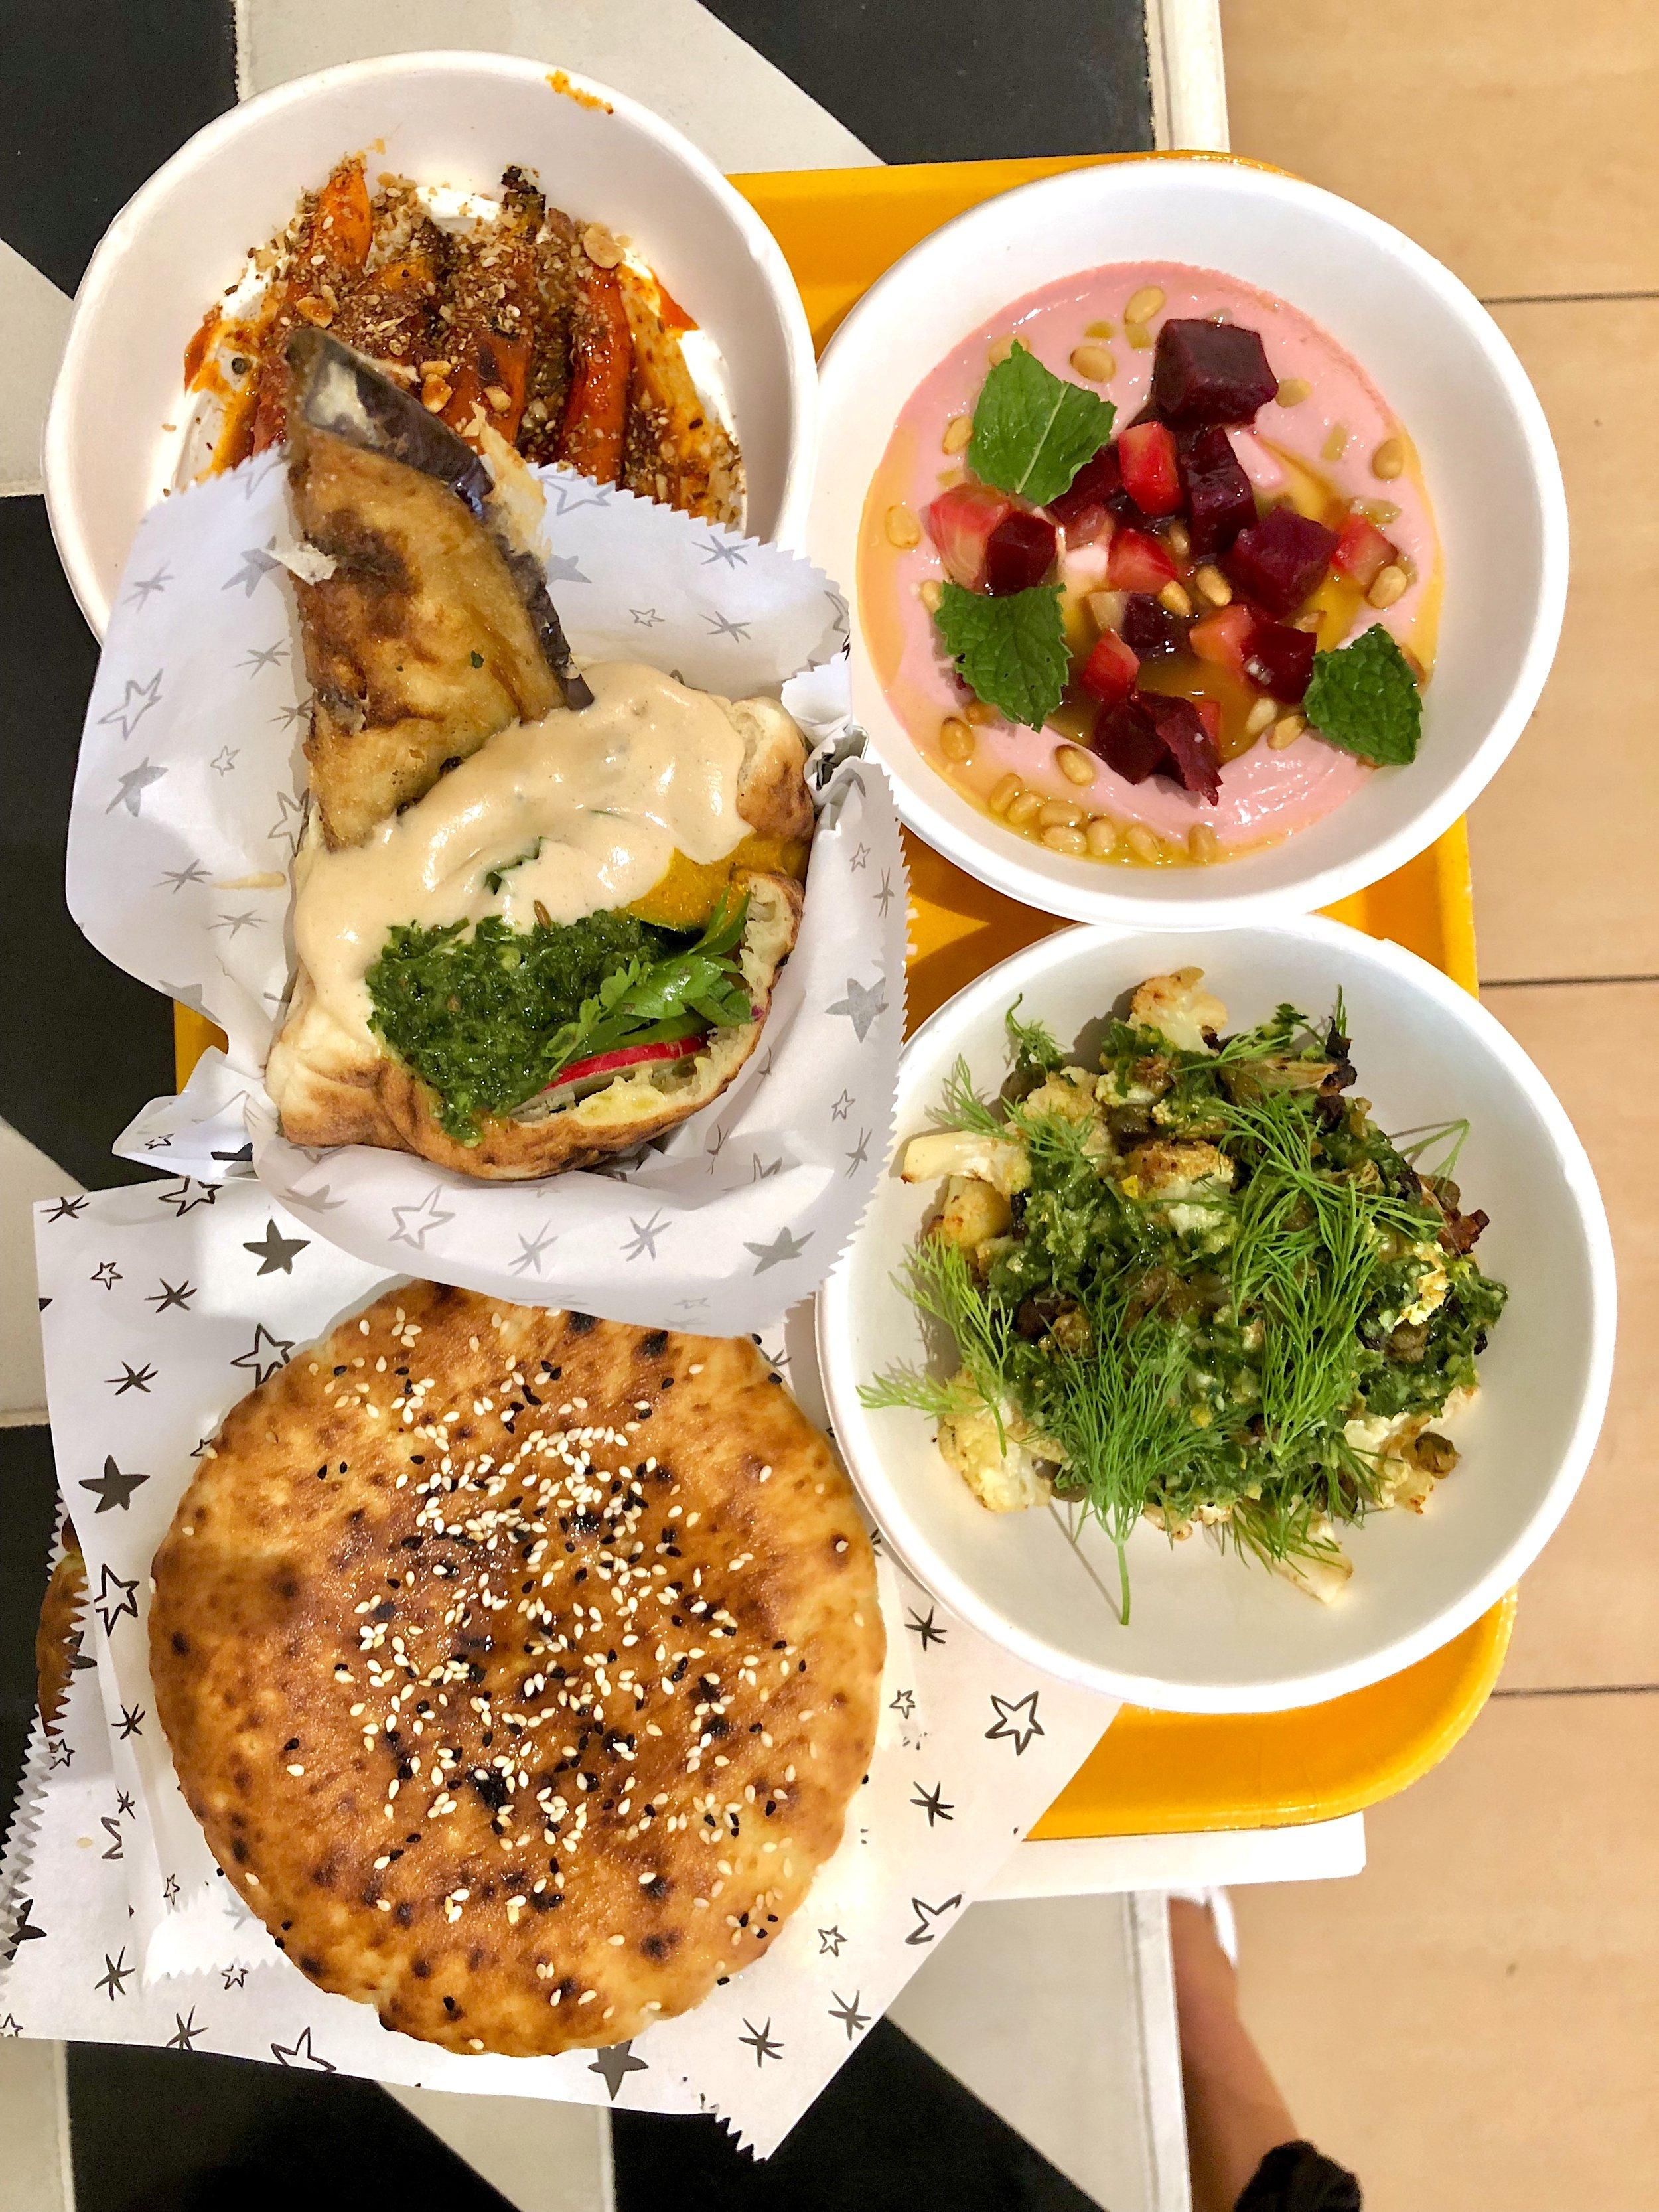 shawarma burger, mezes (carrot, beet, cauliflower), pita bread